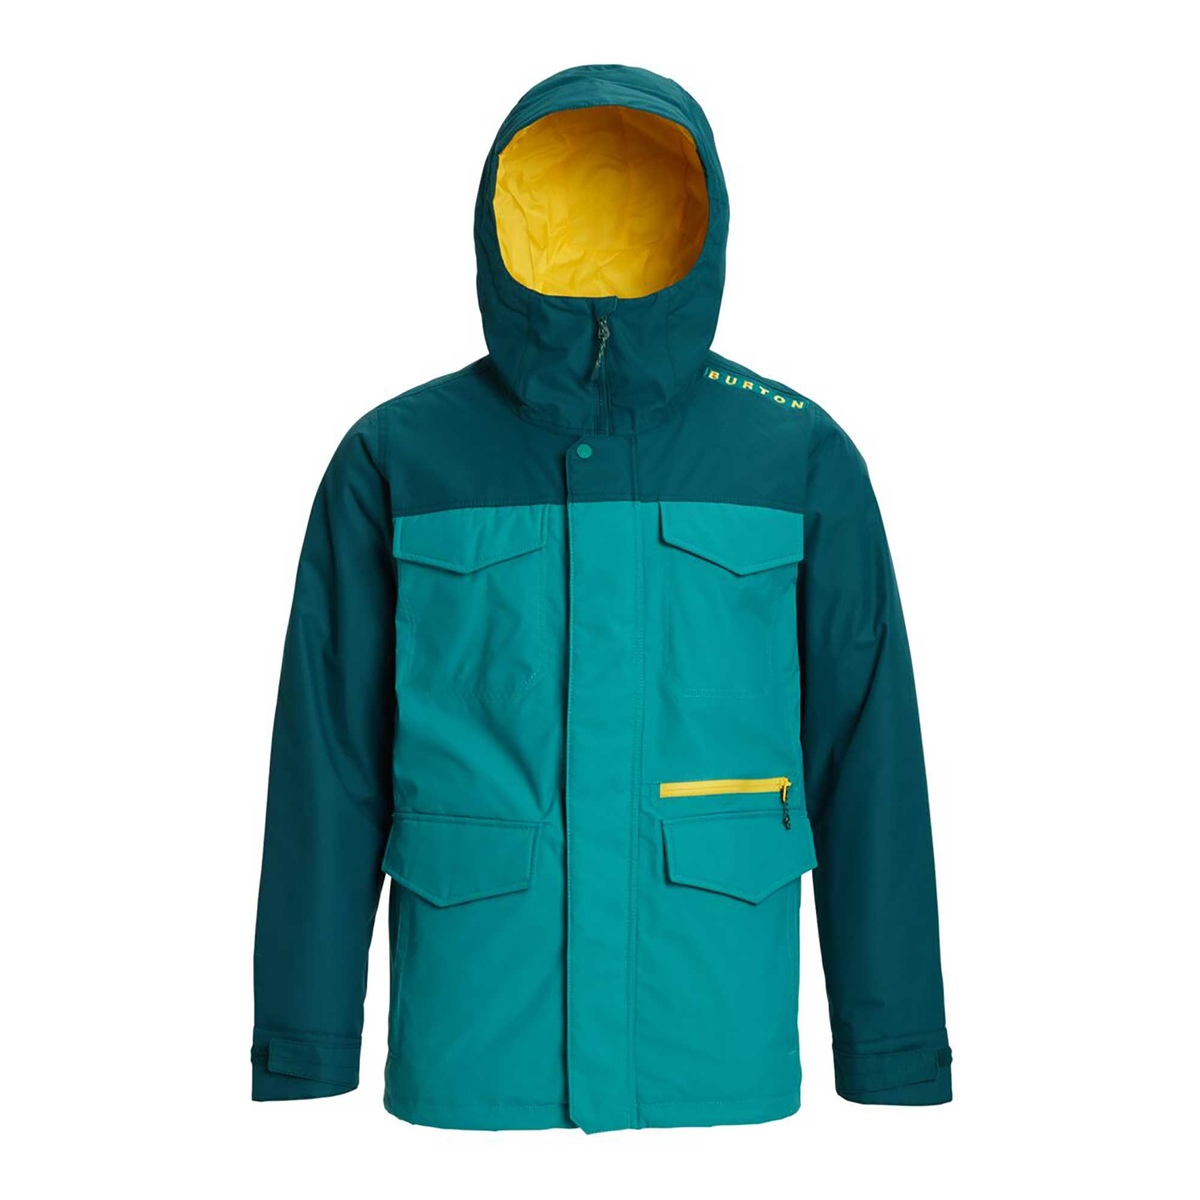 Prezzi Burton giacca covert slim